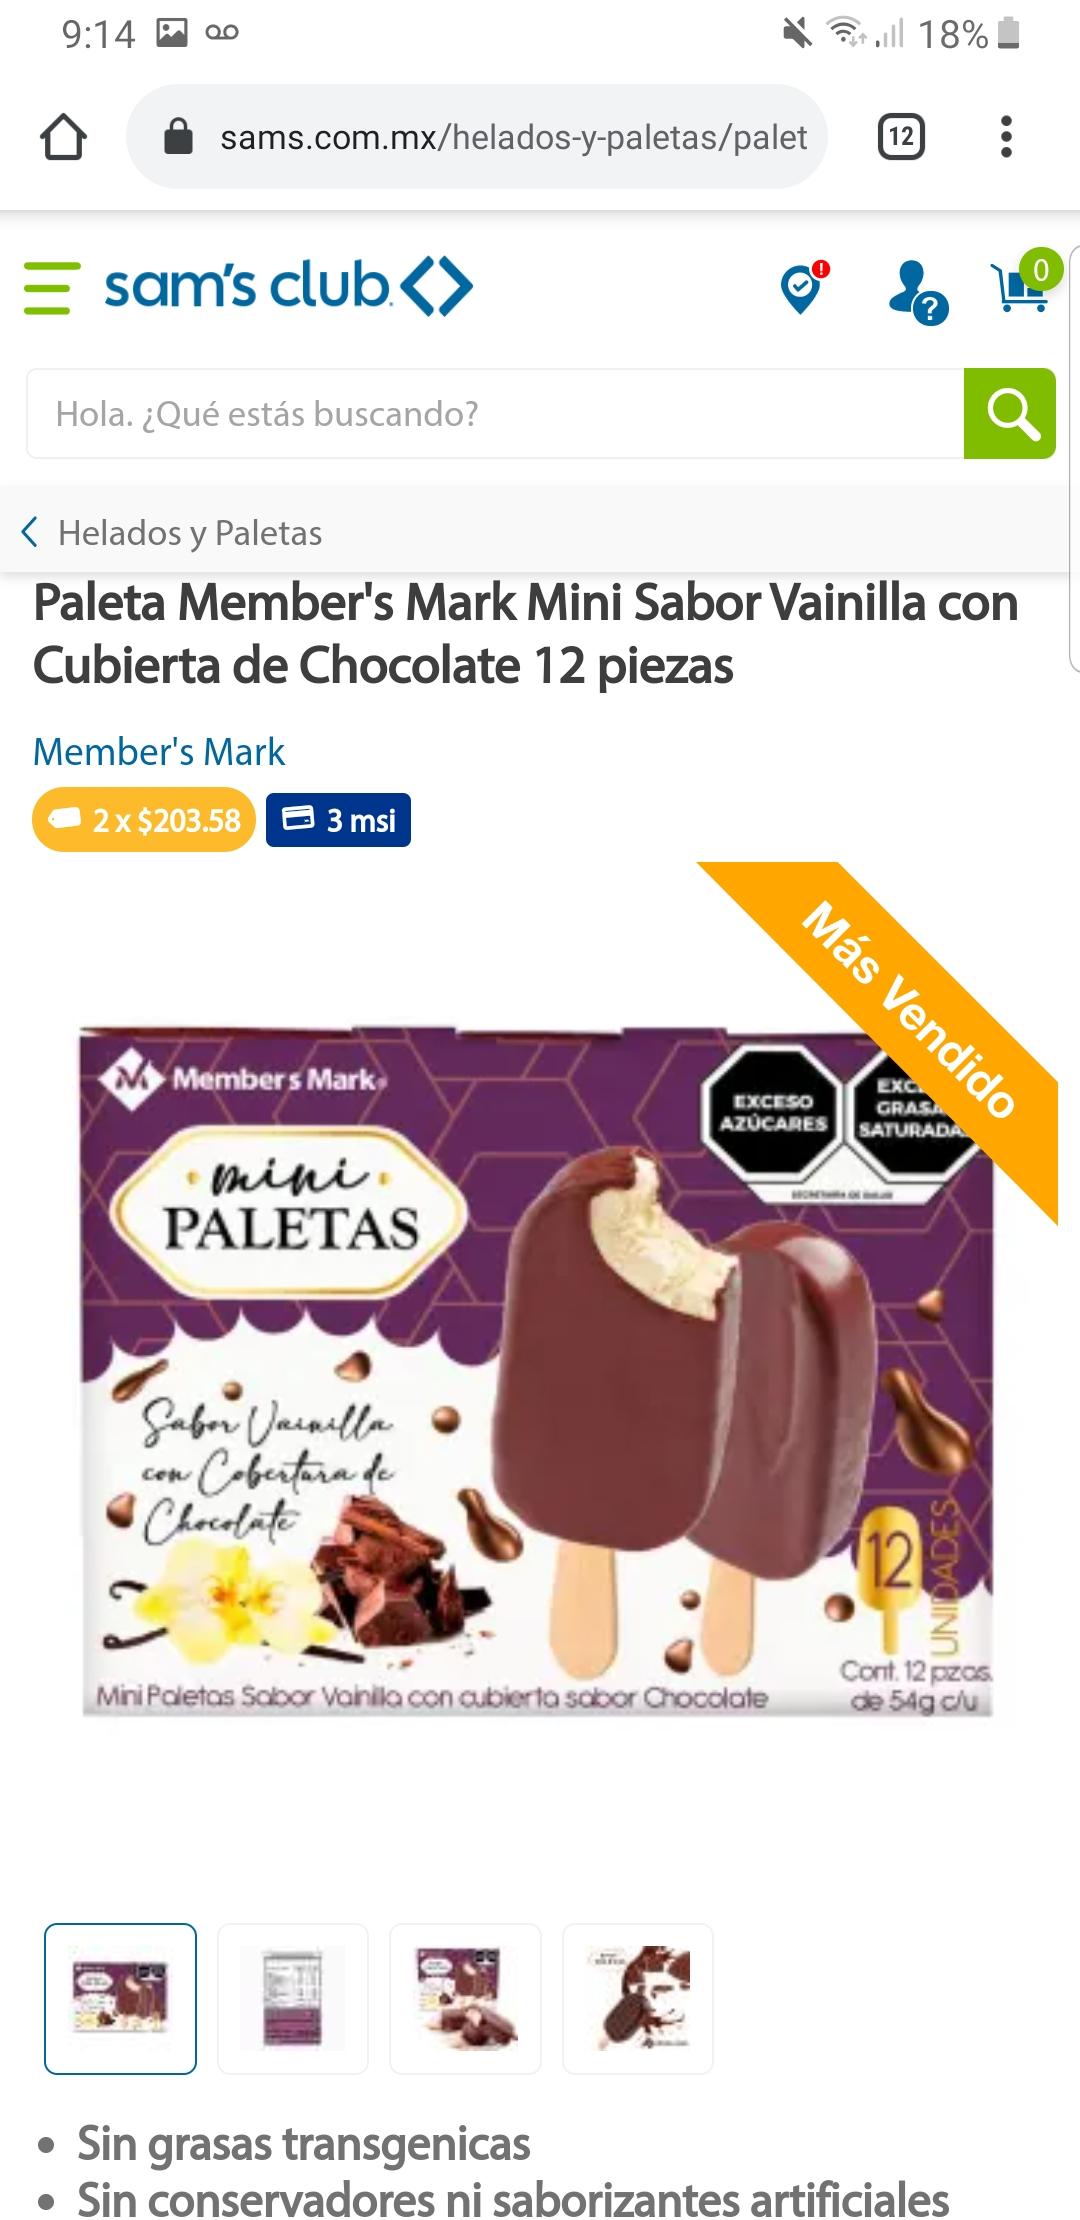 Sam's Club: Mini Paletas Vainilla con Chocolate 24 piezas x $203.58